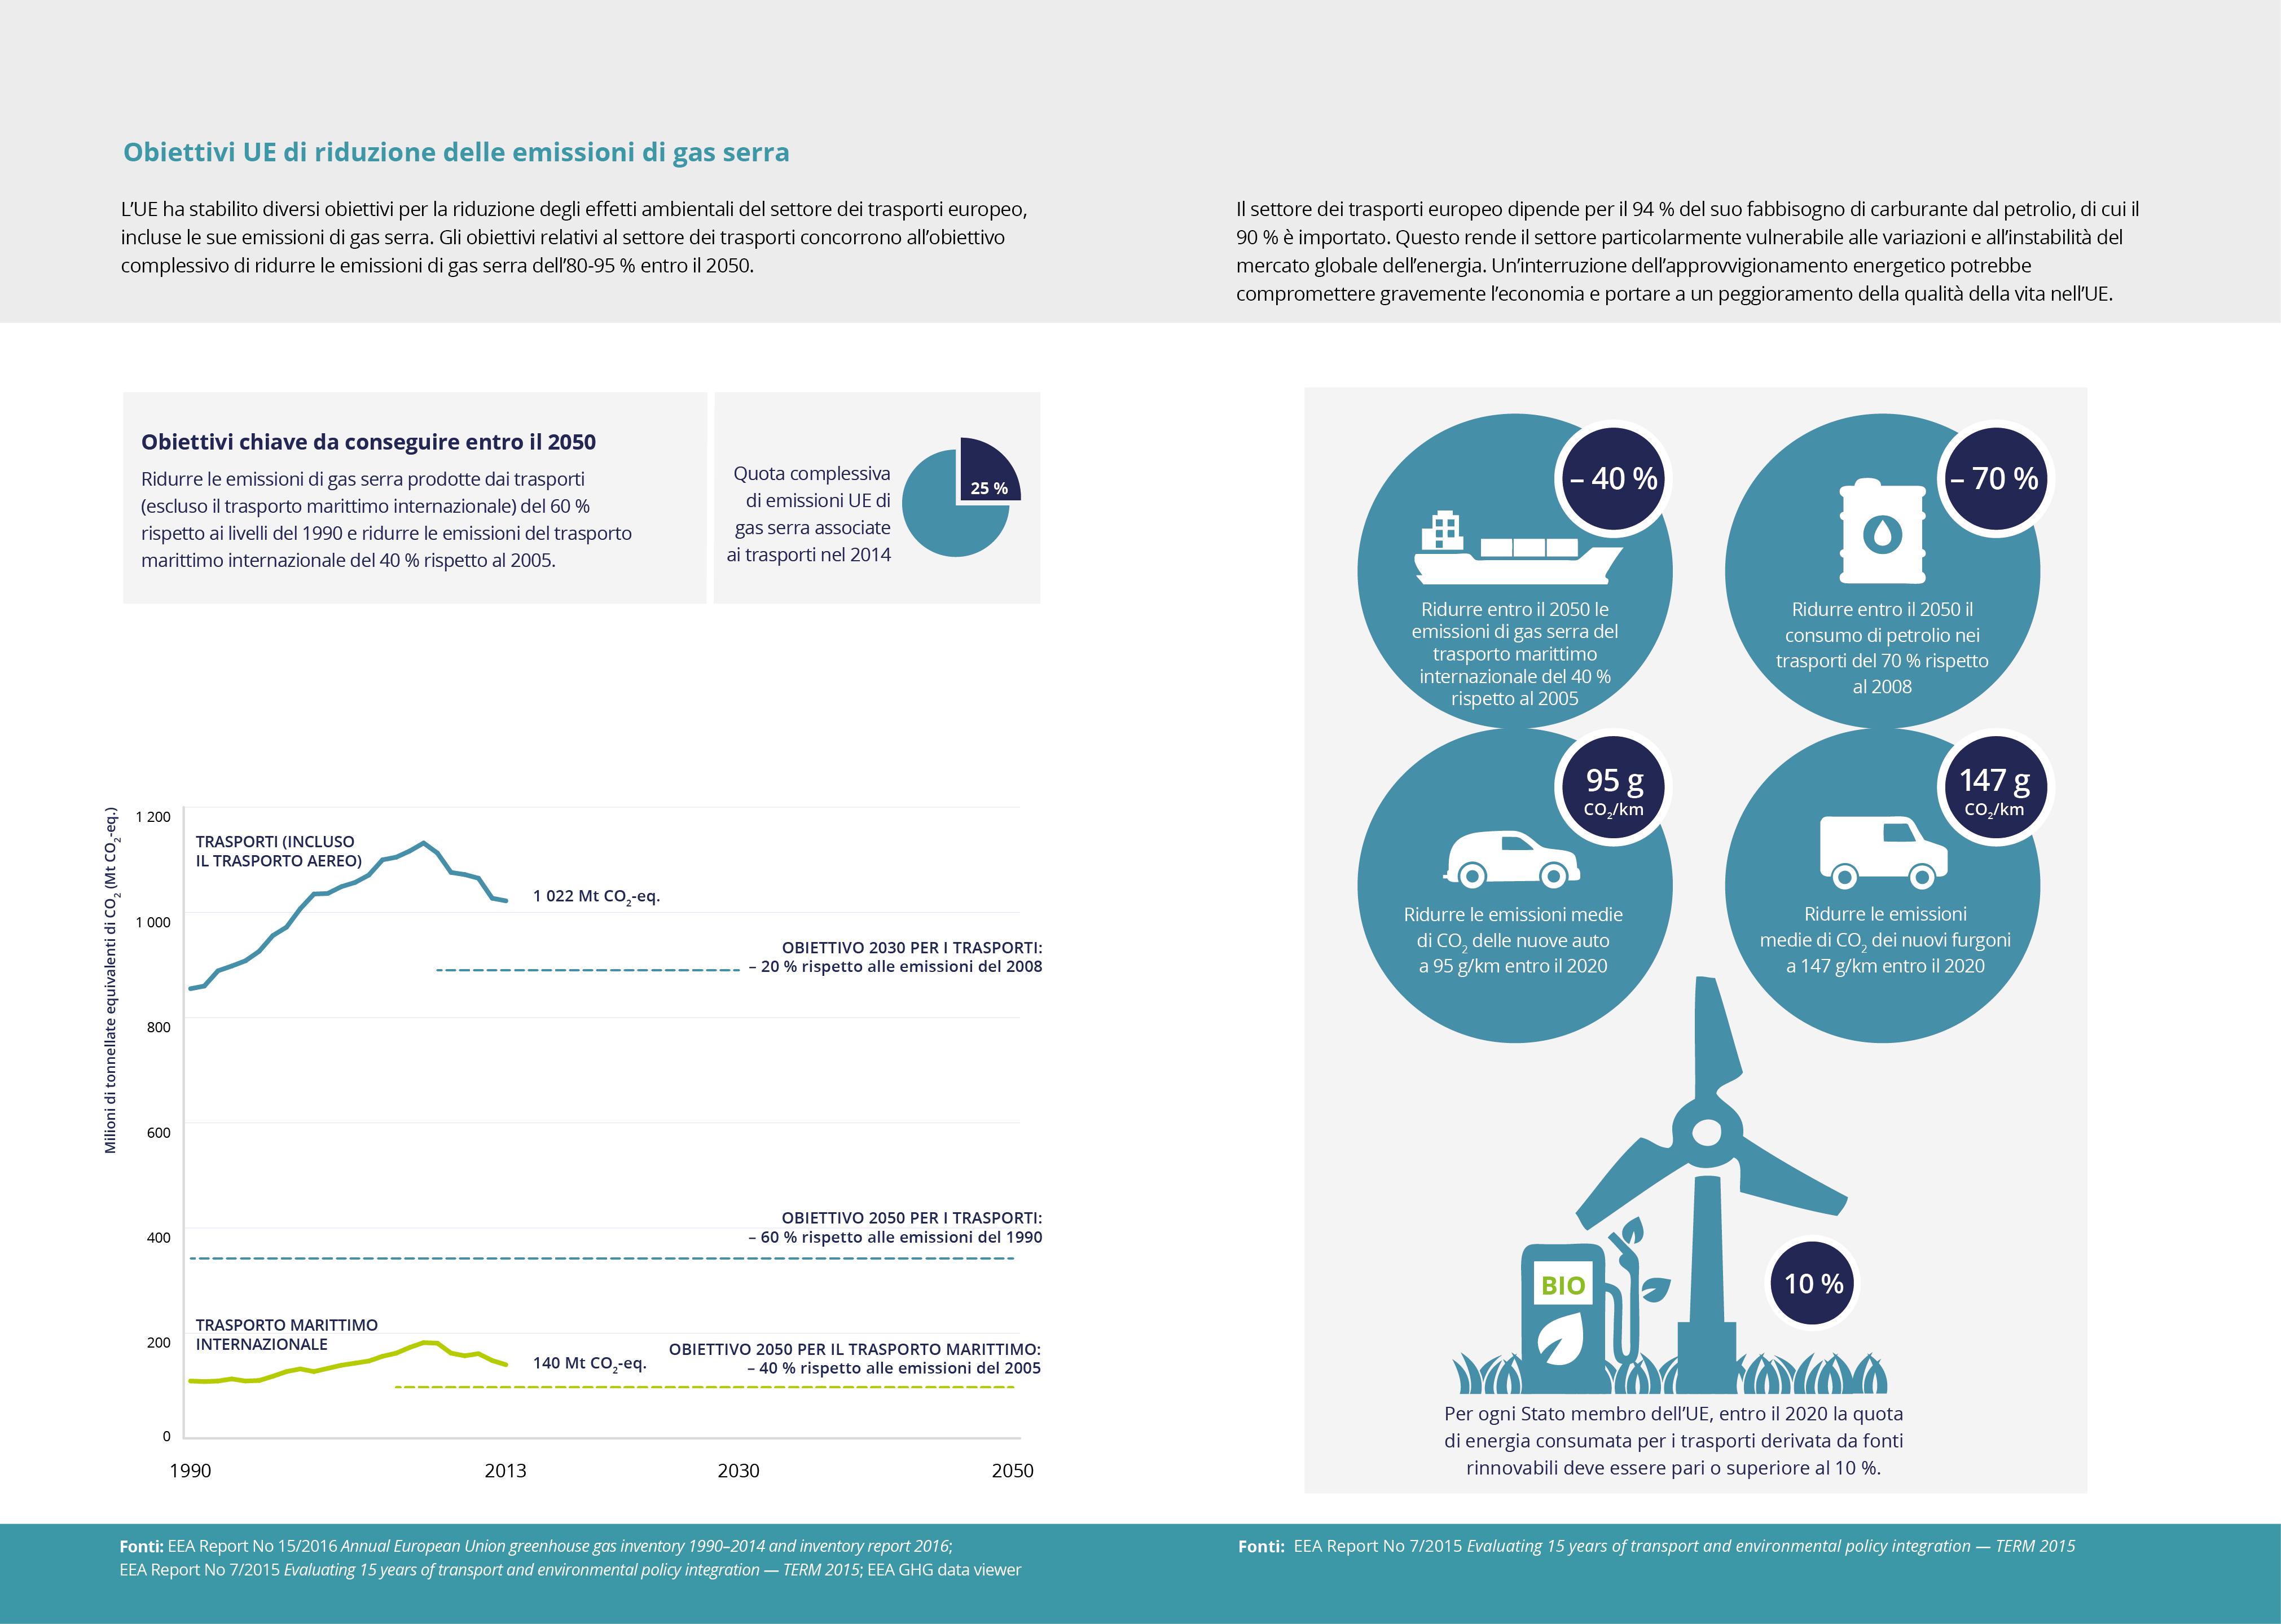 Obiettivi UE di riduzione delle emissioni di gas serra